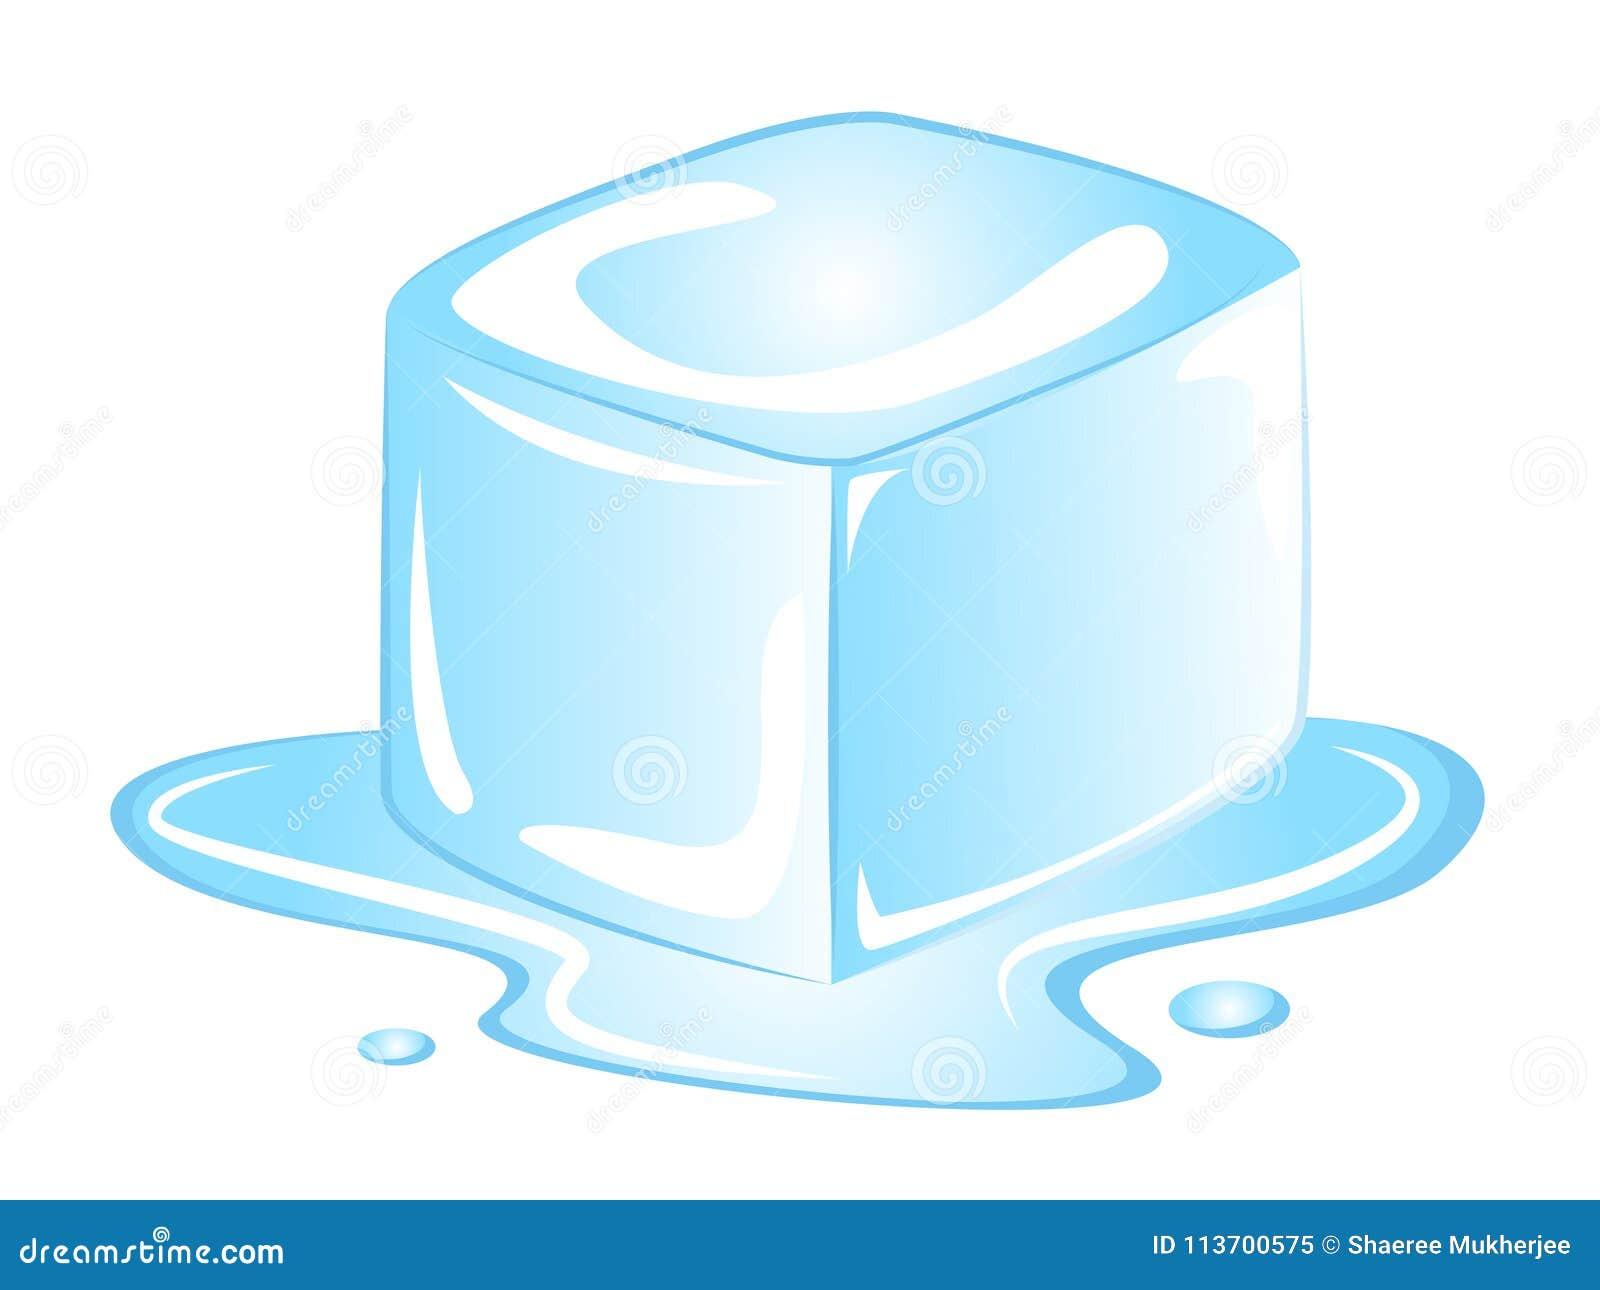 cartoon ice cube stock illustrations 620 cartoon ice cube stock rh dreamstime com cartoon penguin crying ice cubes cartoon movie with ice cube